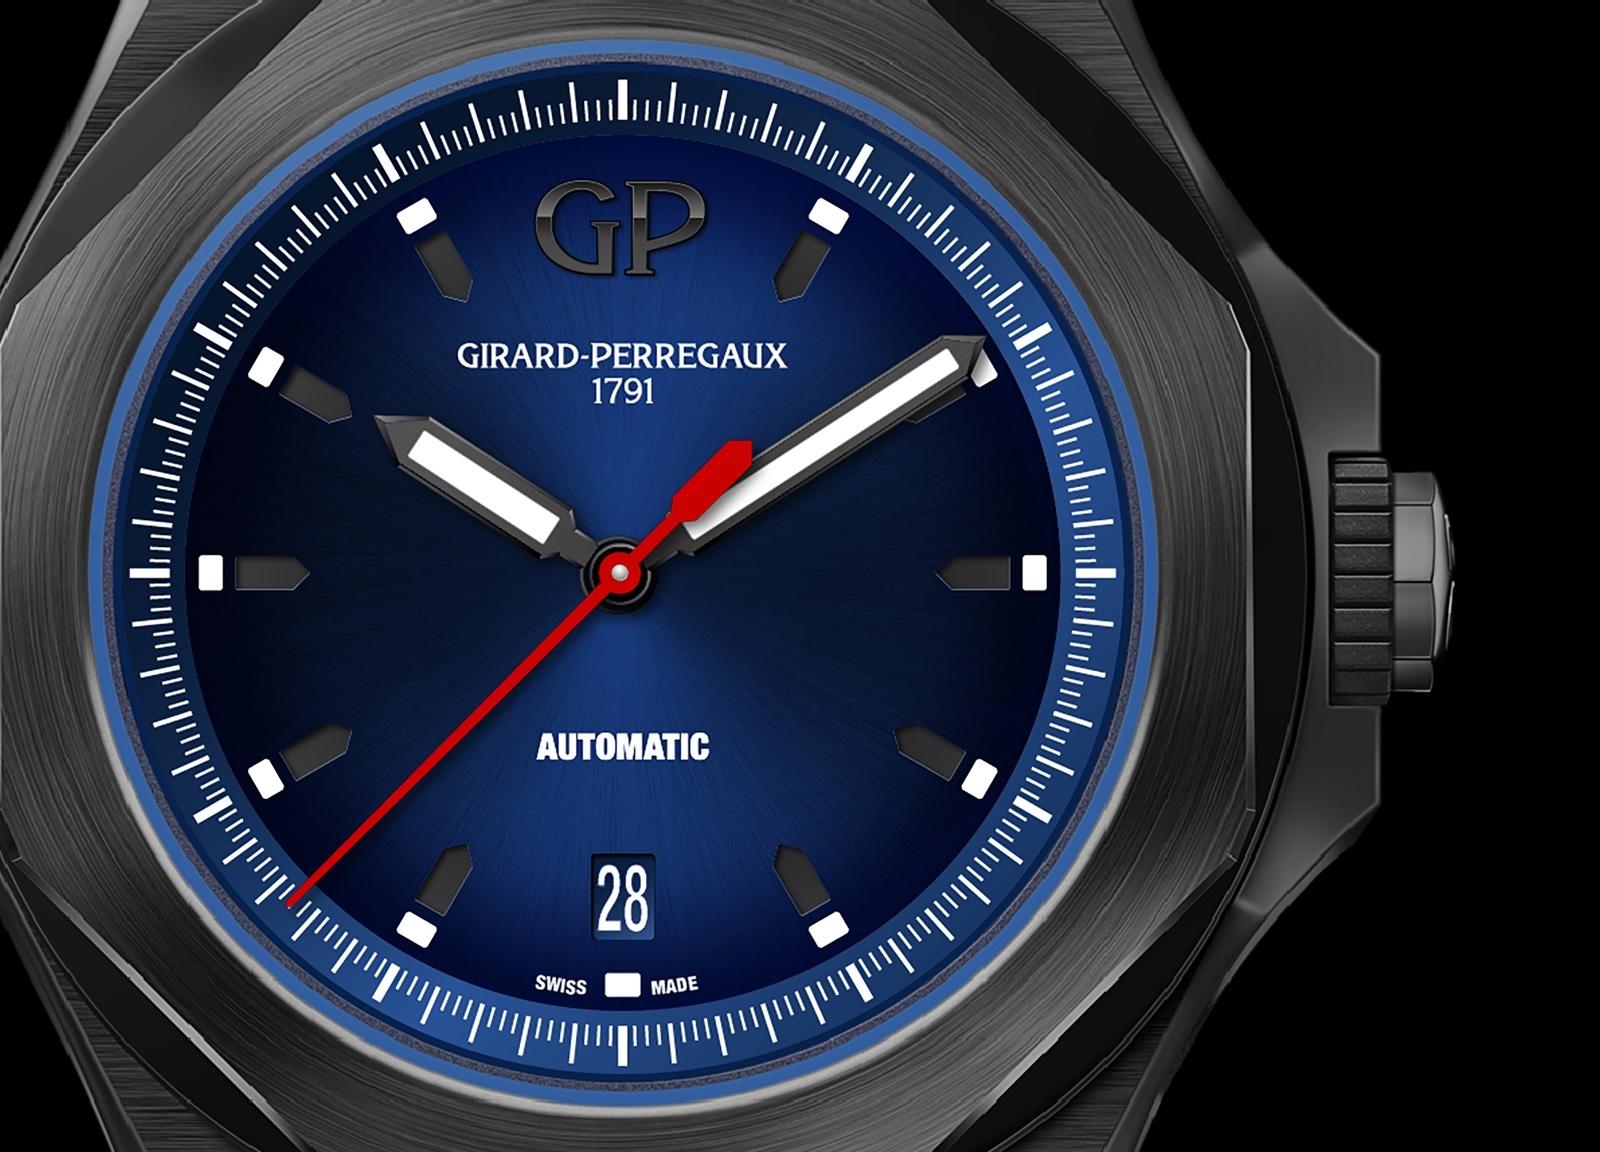 Girard-Perregaux Laureato Absolute Automatic Detalle Esfera